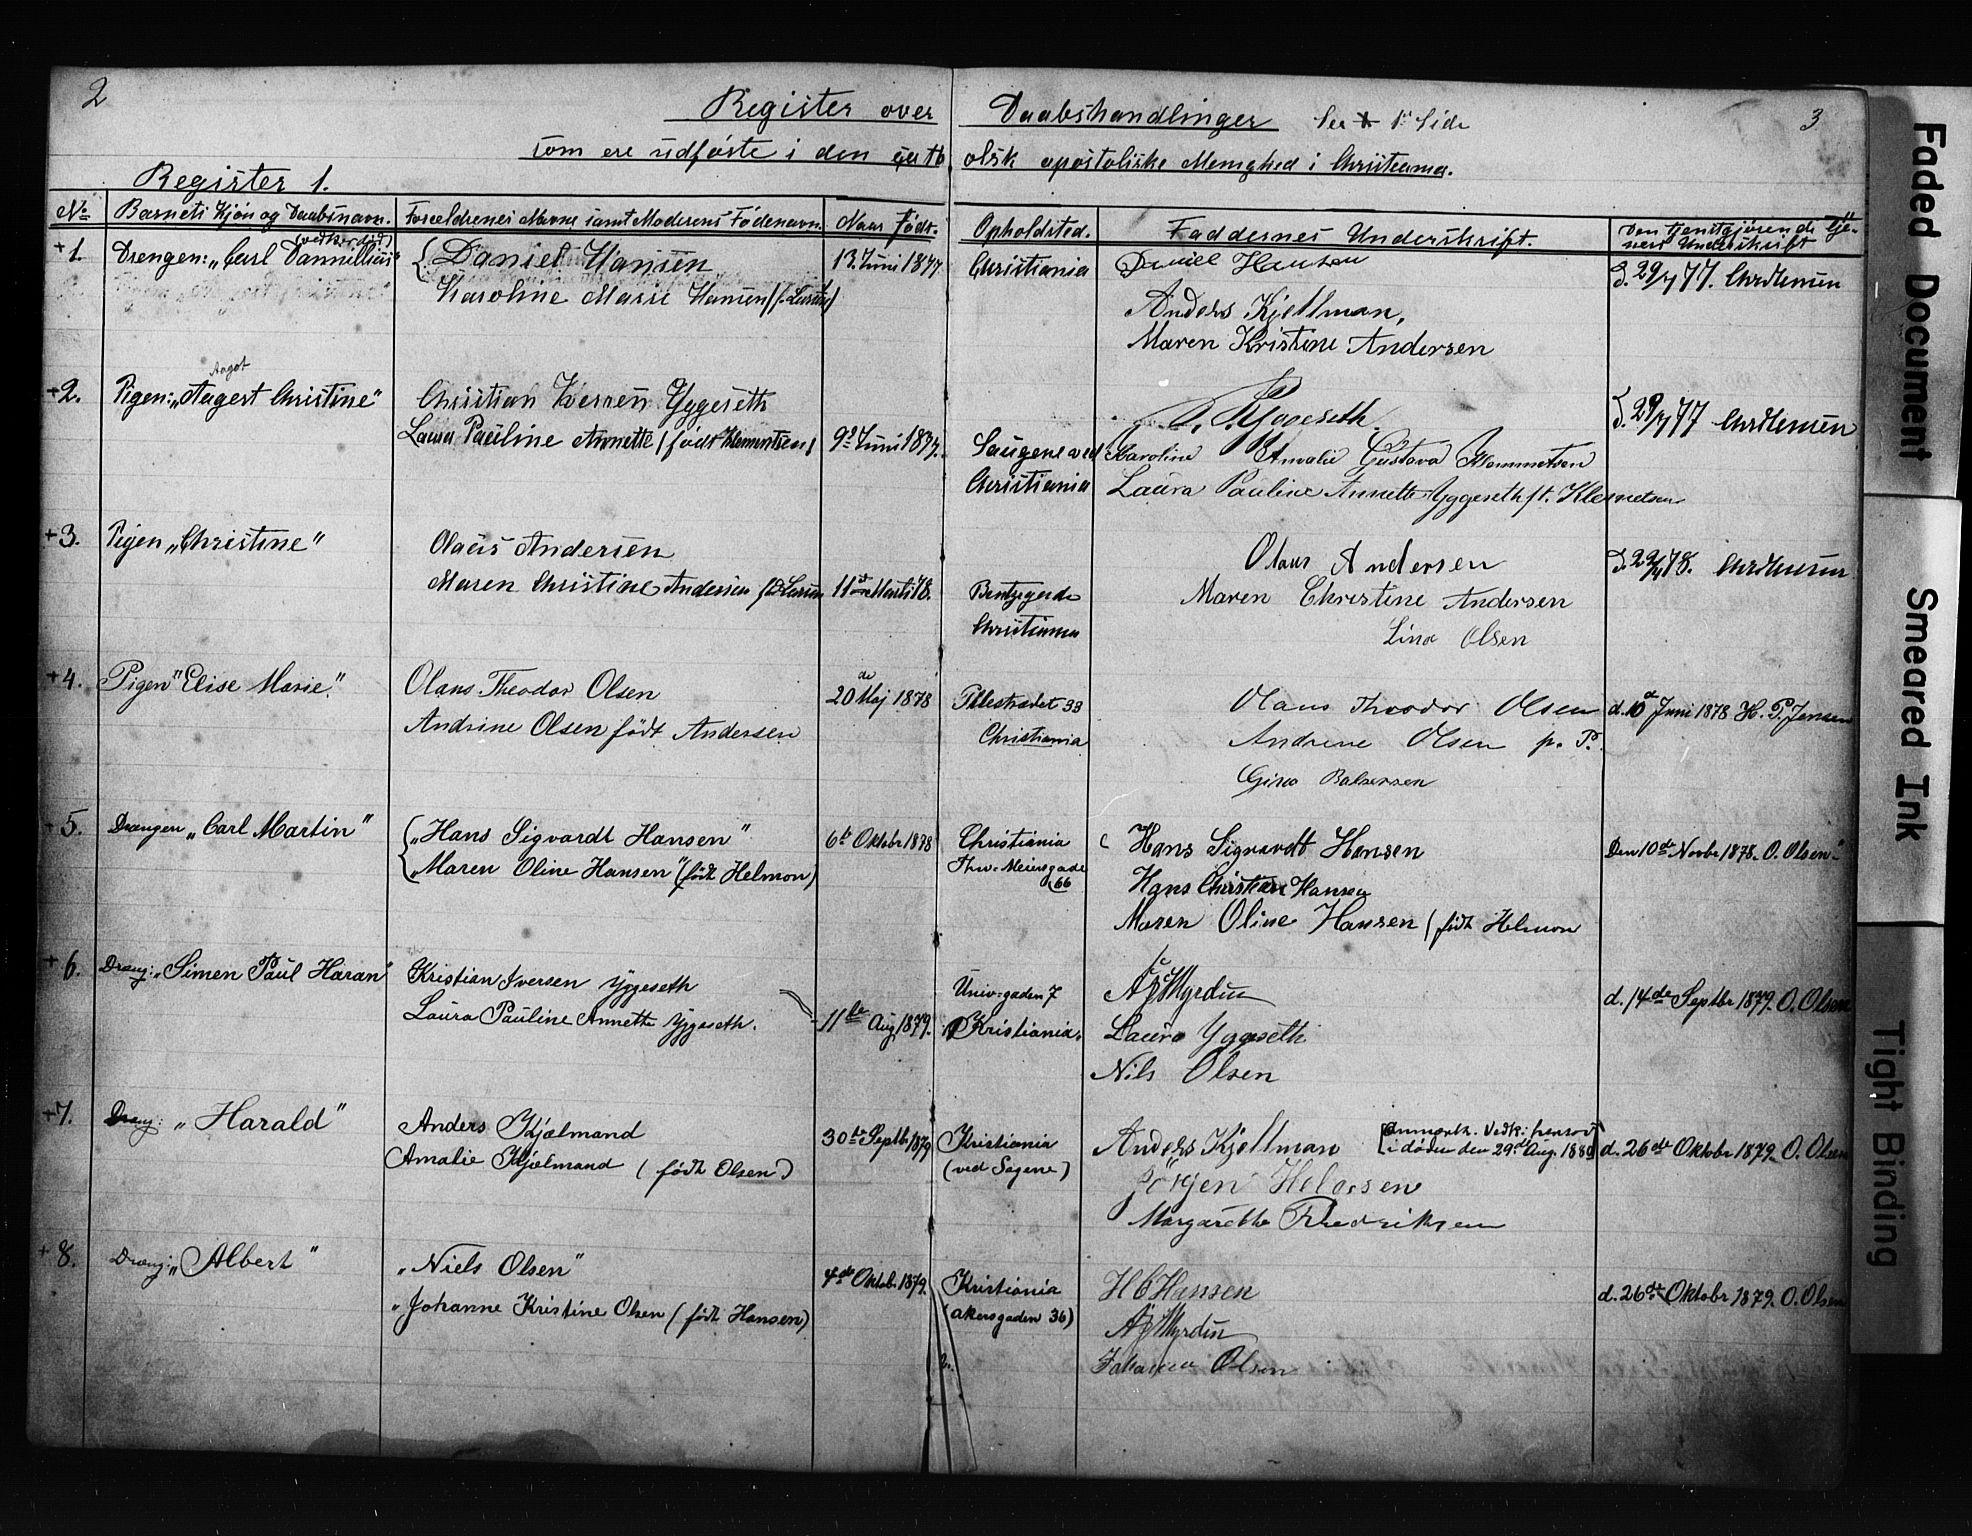 SAO, Den katolsk apostoliske menighet i Oslo , F/Fb/L0001: Dissenterprotokoll nr. 1, 1877-1894, s. 2-3